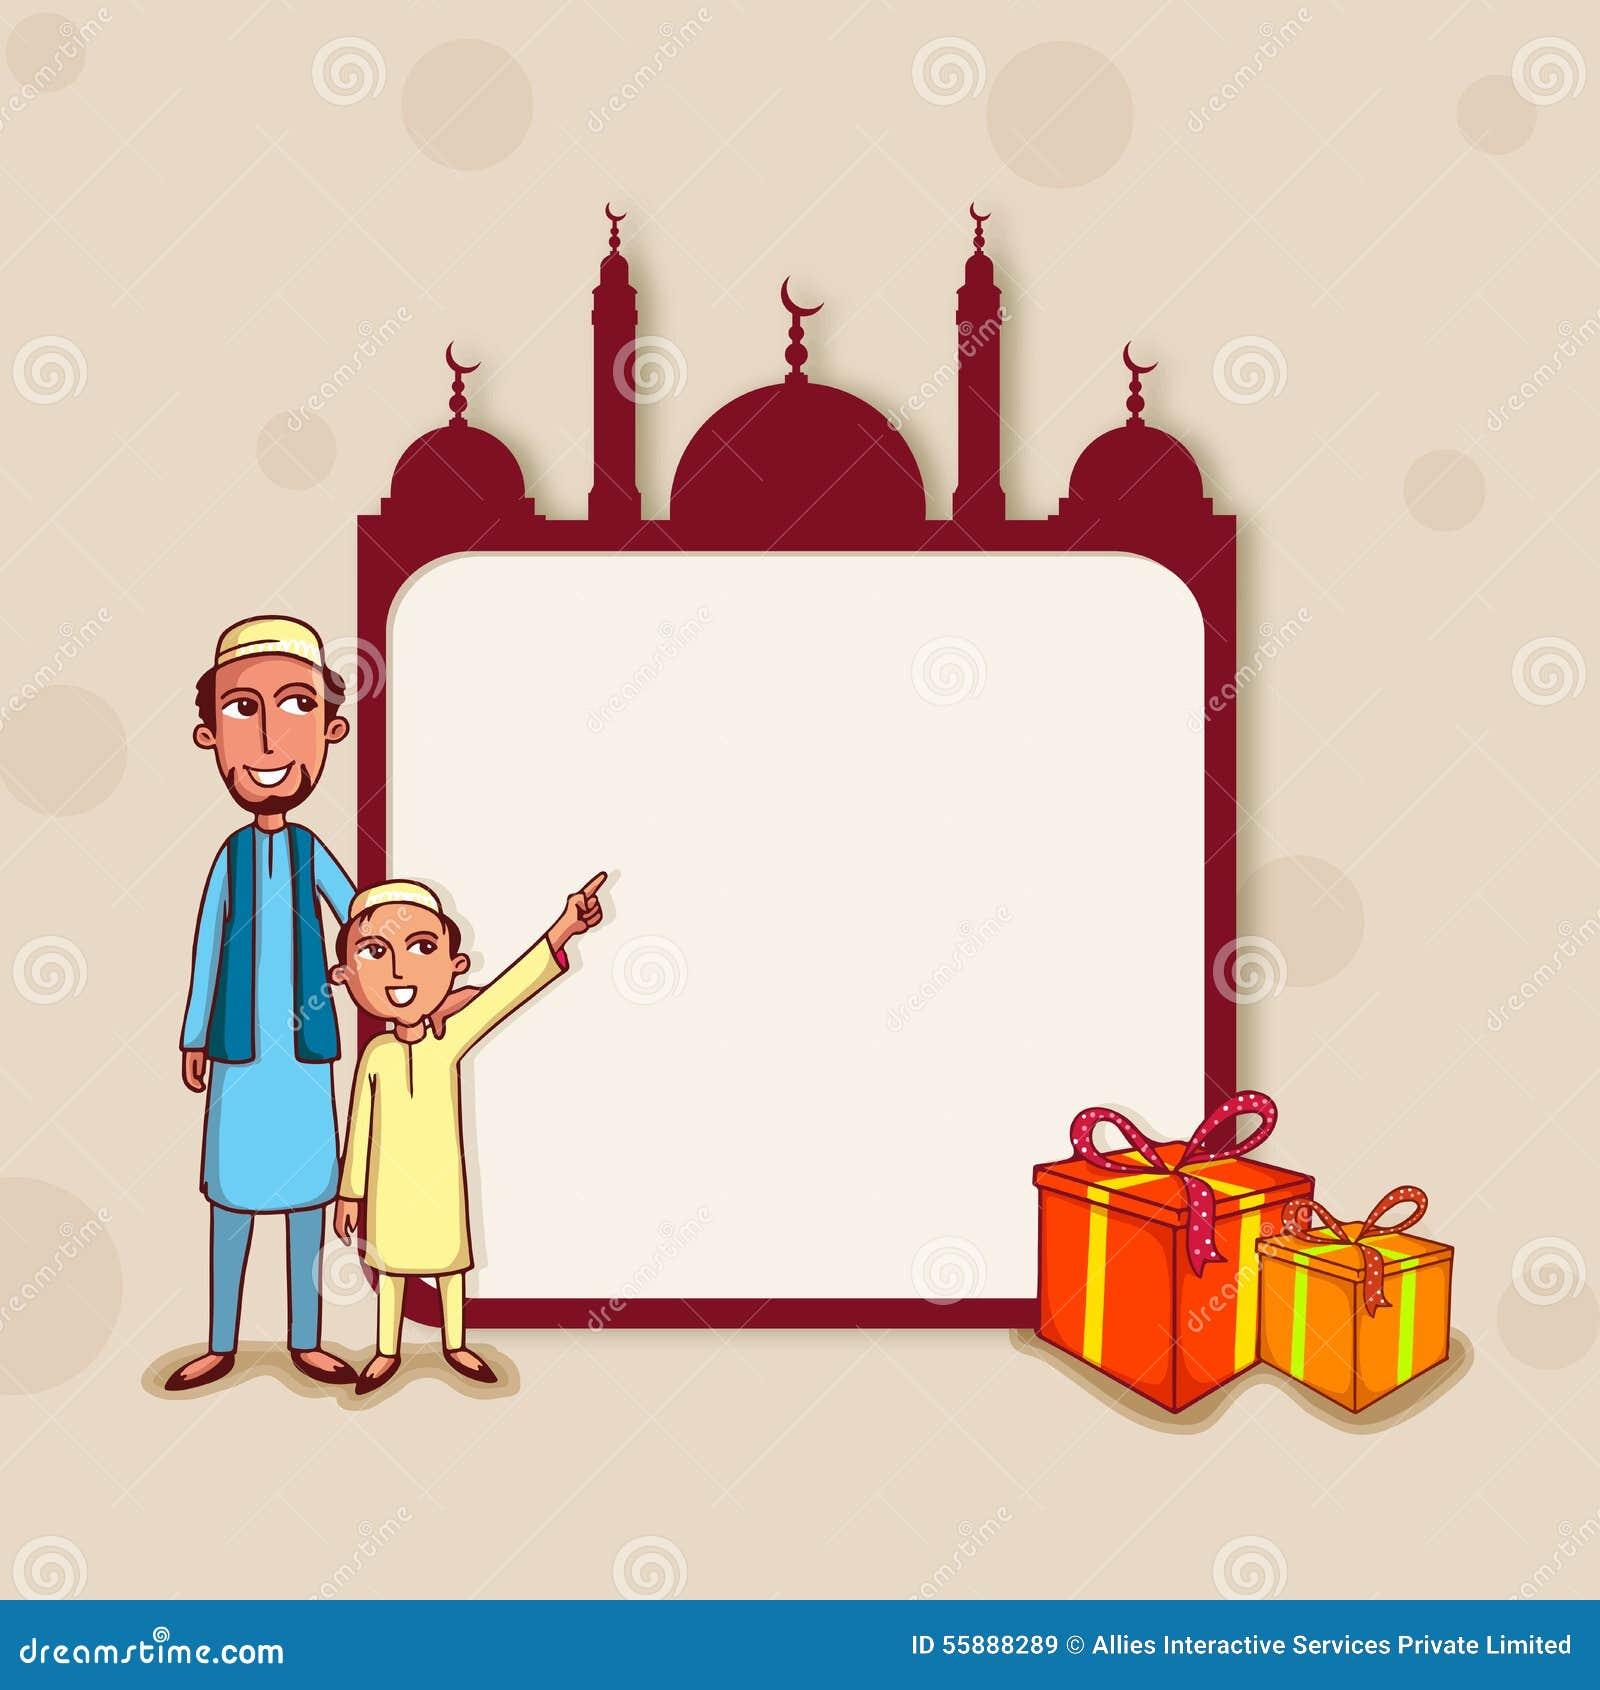 Stylish Frame With Muslim People For Eid Celebration. Royalty-Free ...